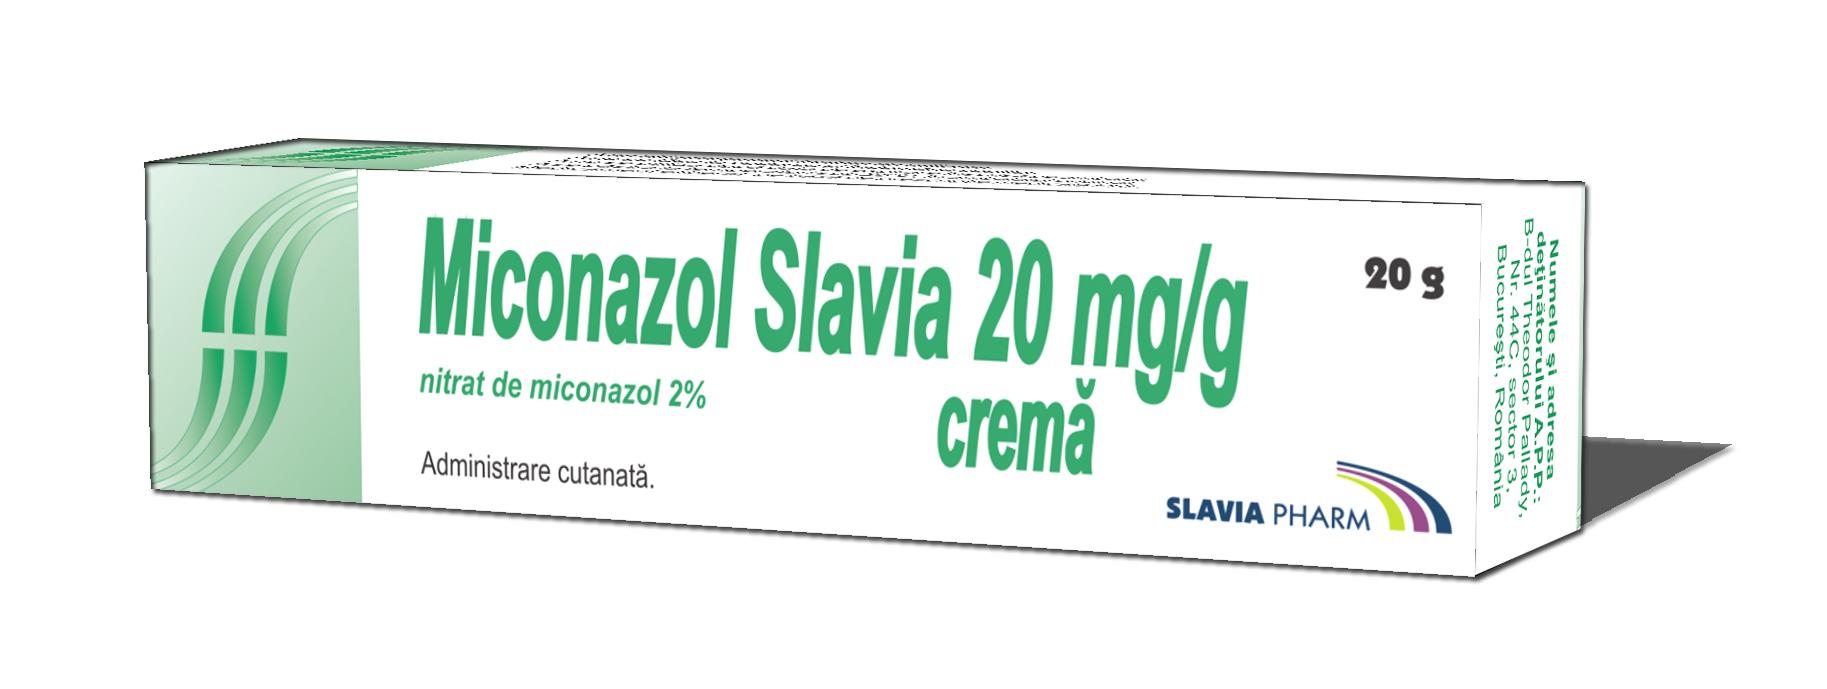 Miconazol_PL-P347C.cdr